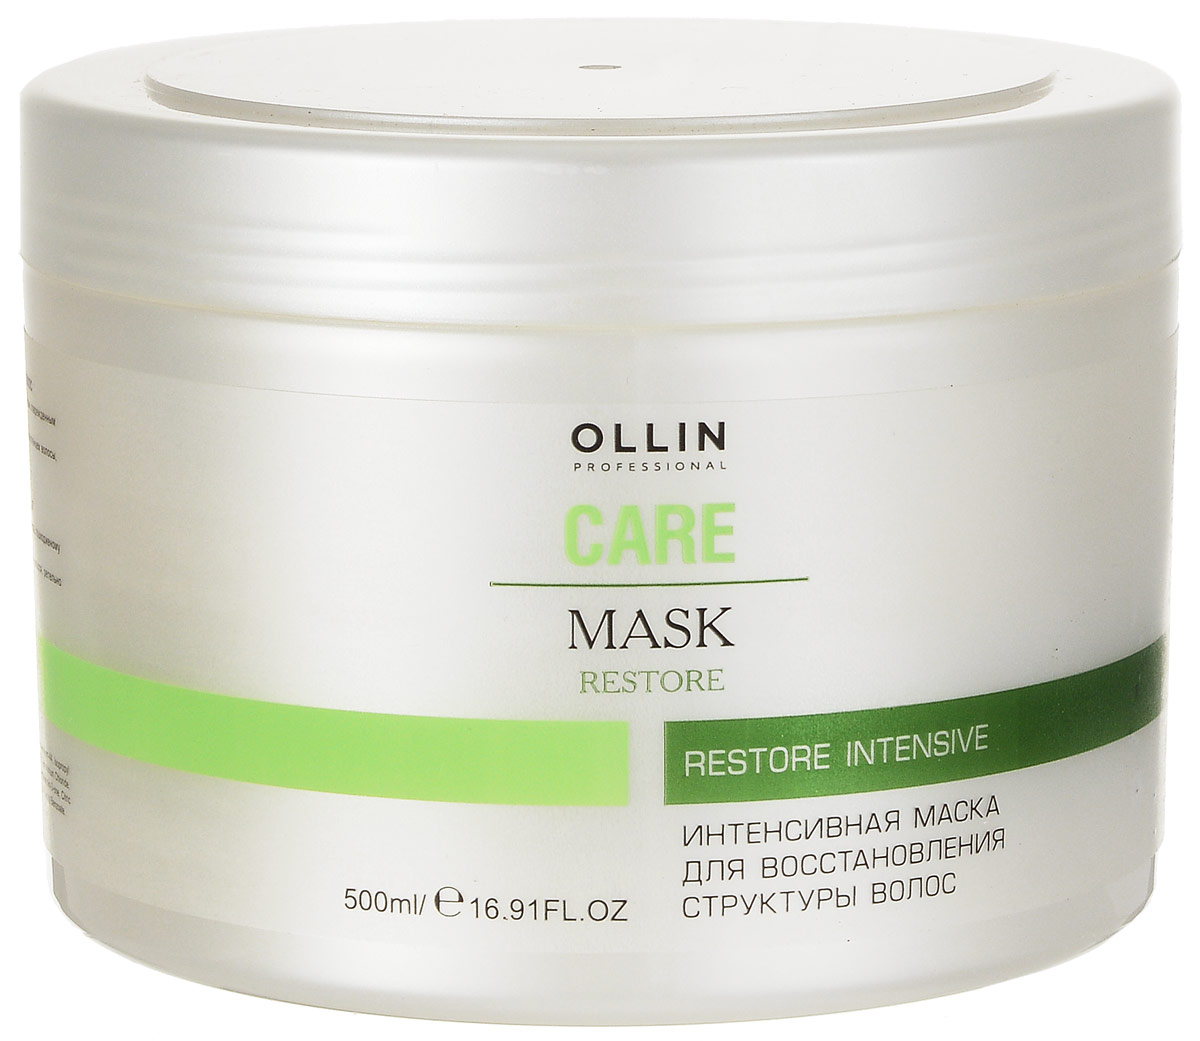 Ollin Интенсивная маска для восстановления структуры волос Care Restore Intensive Mask 500 мл маска ollin professional restore intensive mask